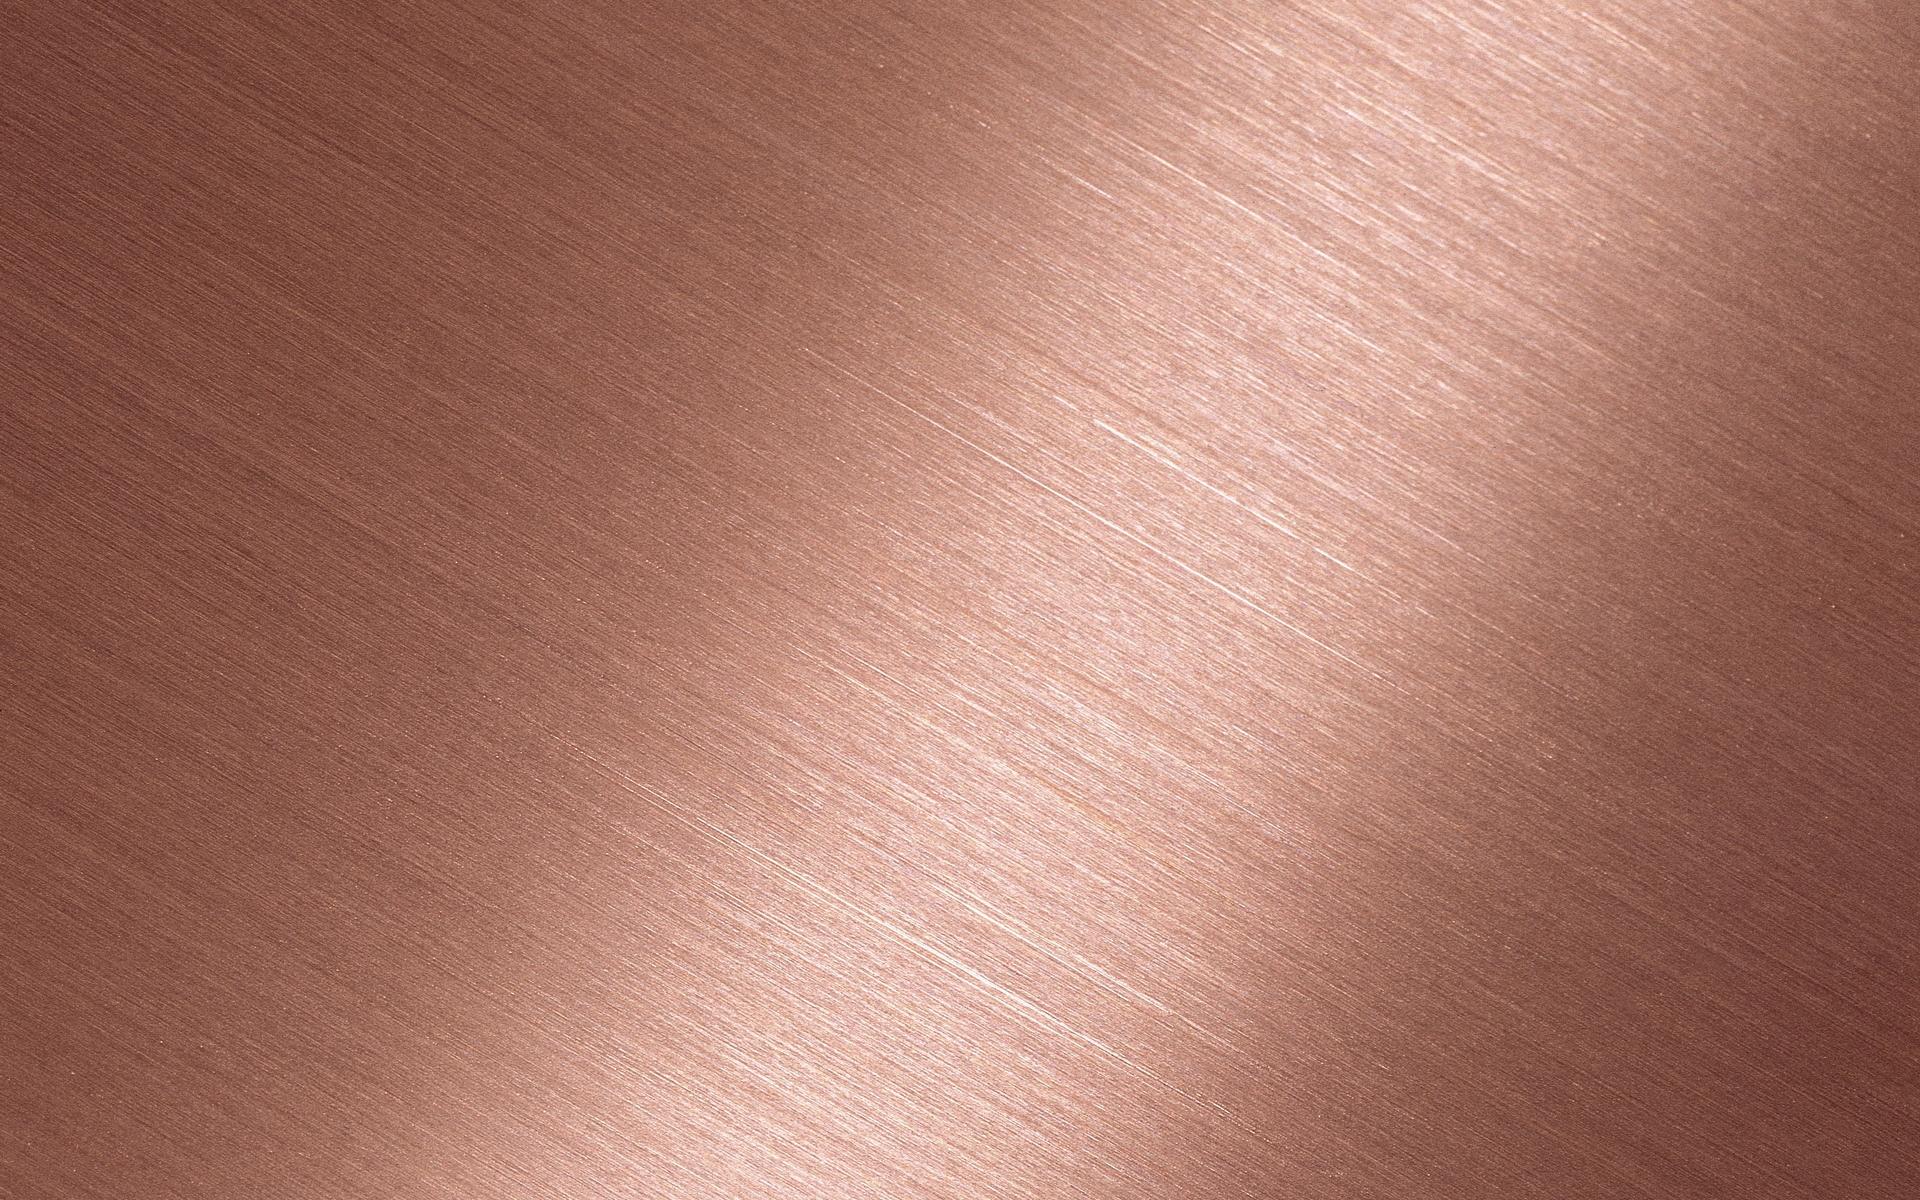 Metal white pink glitter glow wallpaper   ForWallpapercom 1920x1200